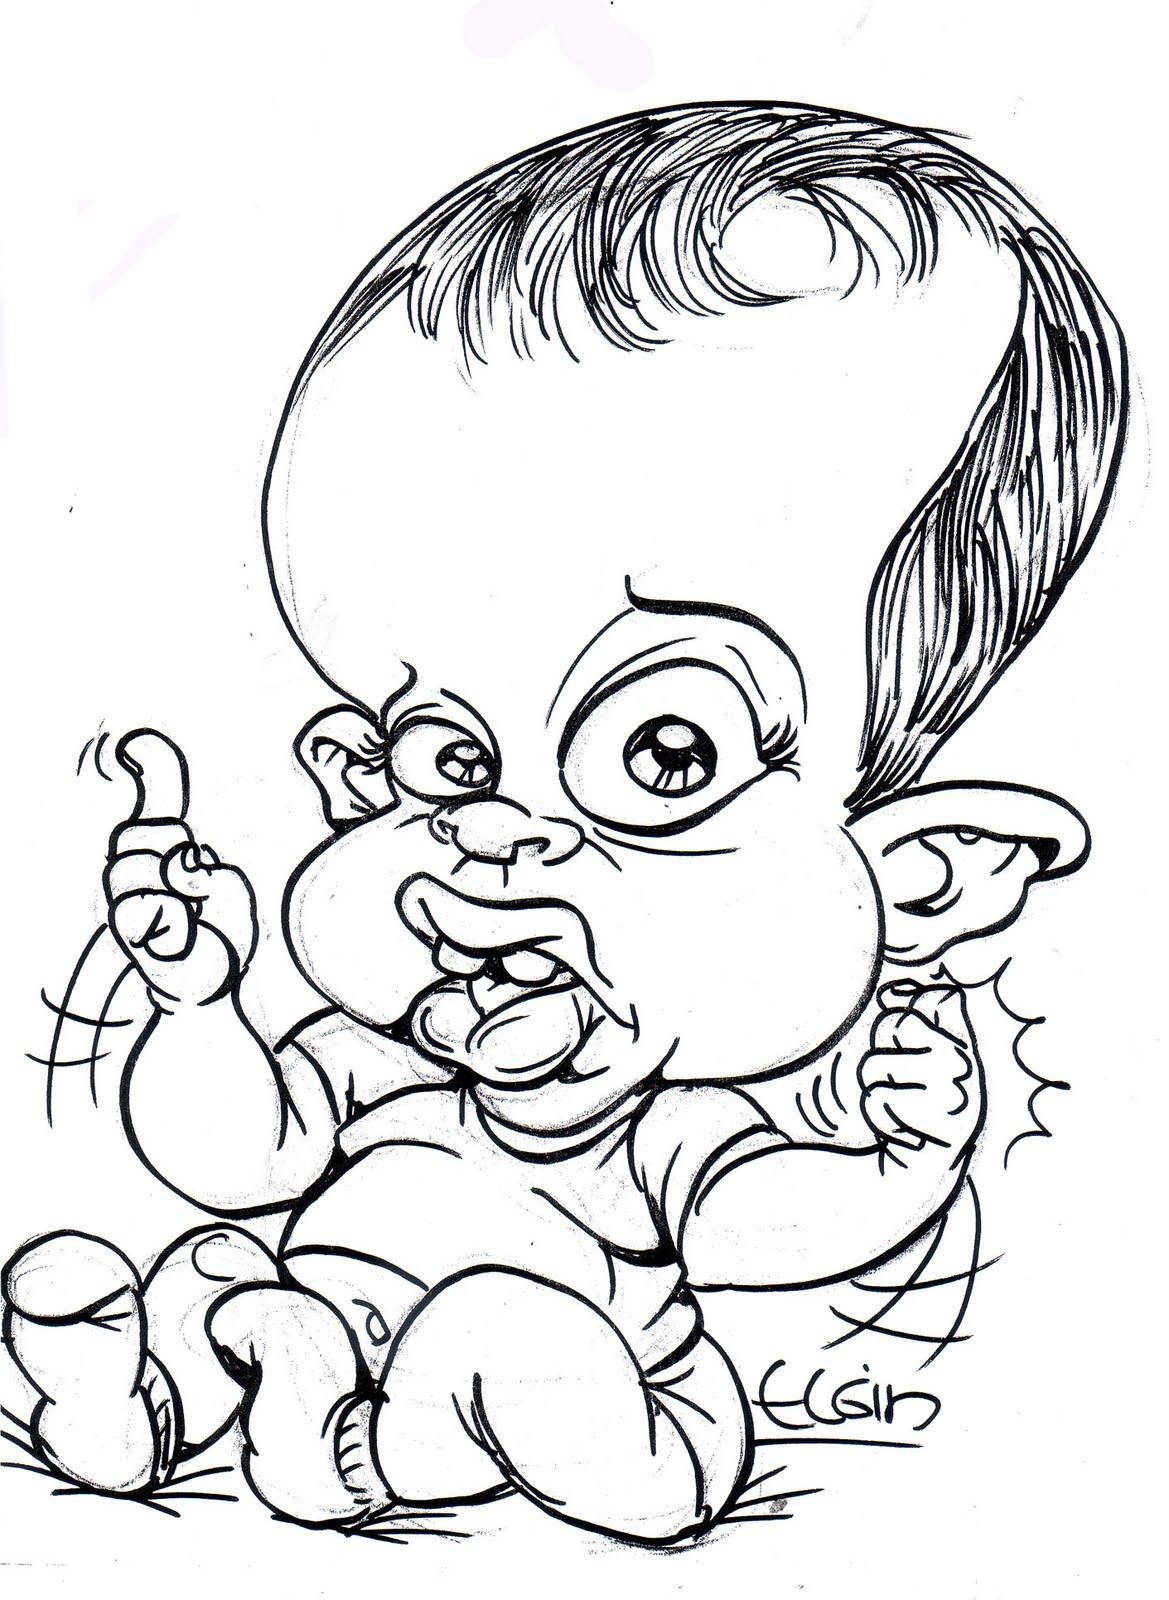 http://2.bp.blogspot.com/_sztCMNFK1K4/S_nytwdnH2I/AAAAAAAAEwg/3qJaSeQcRis/s1600/baby%2Bwith%2Bfist.jpg